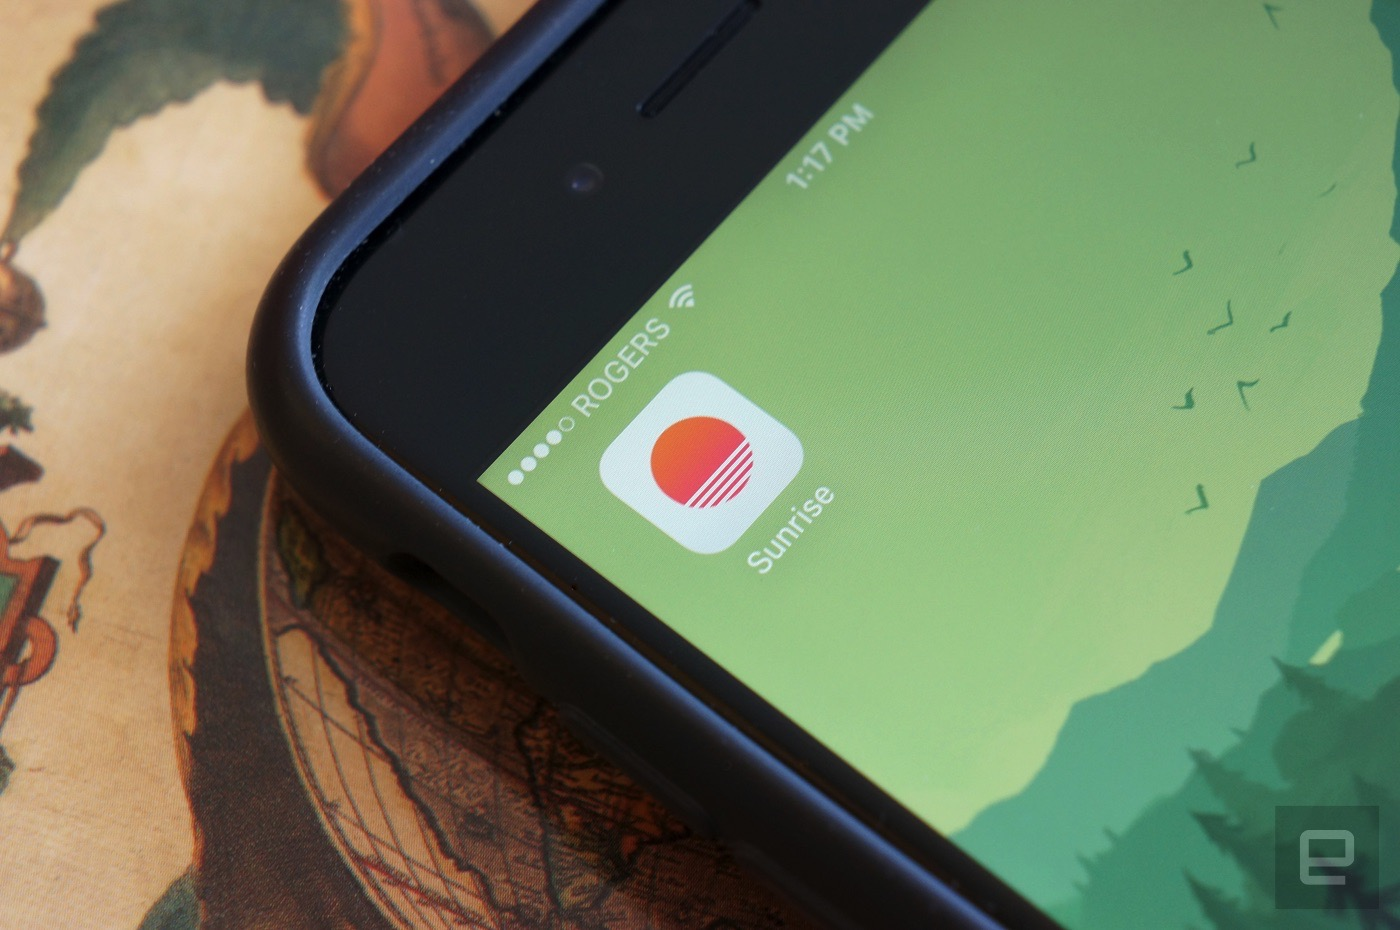 Sunrise shuts down its calendar app on August 31st